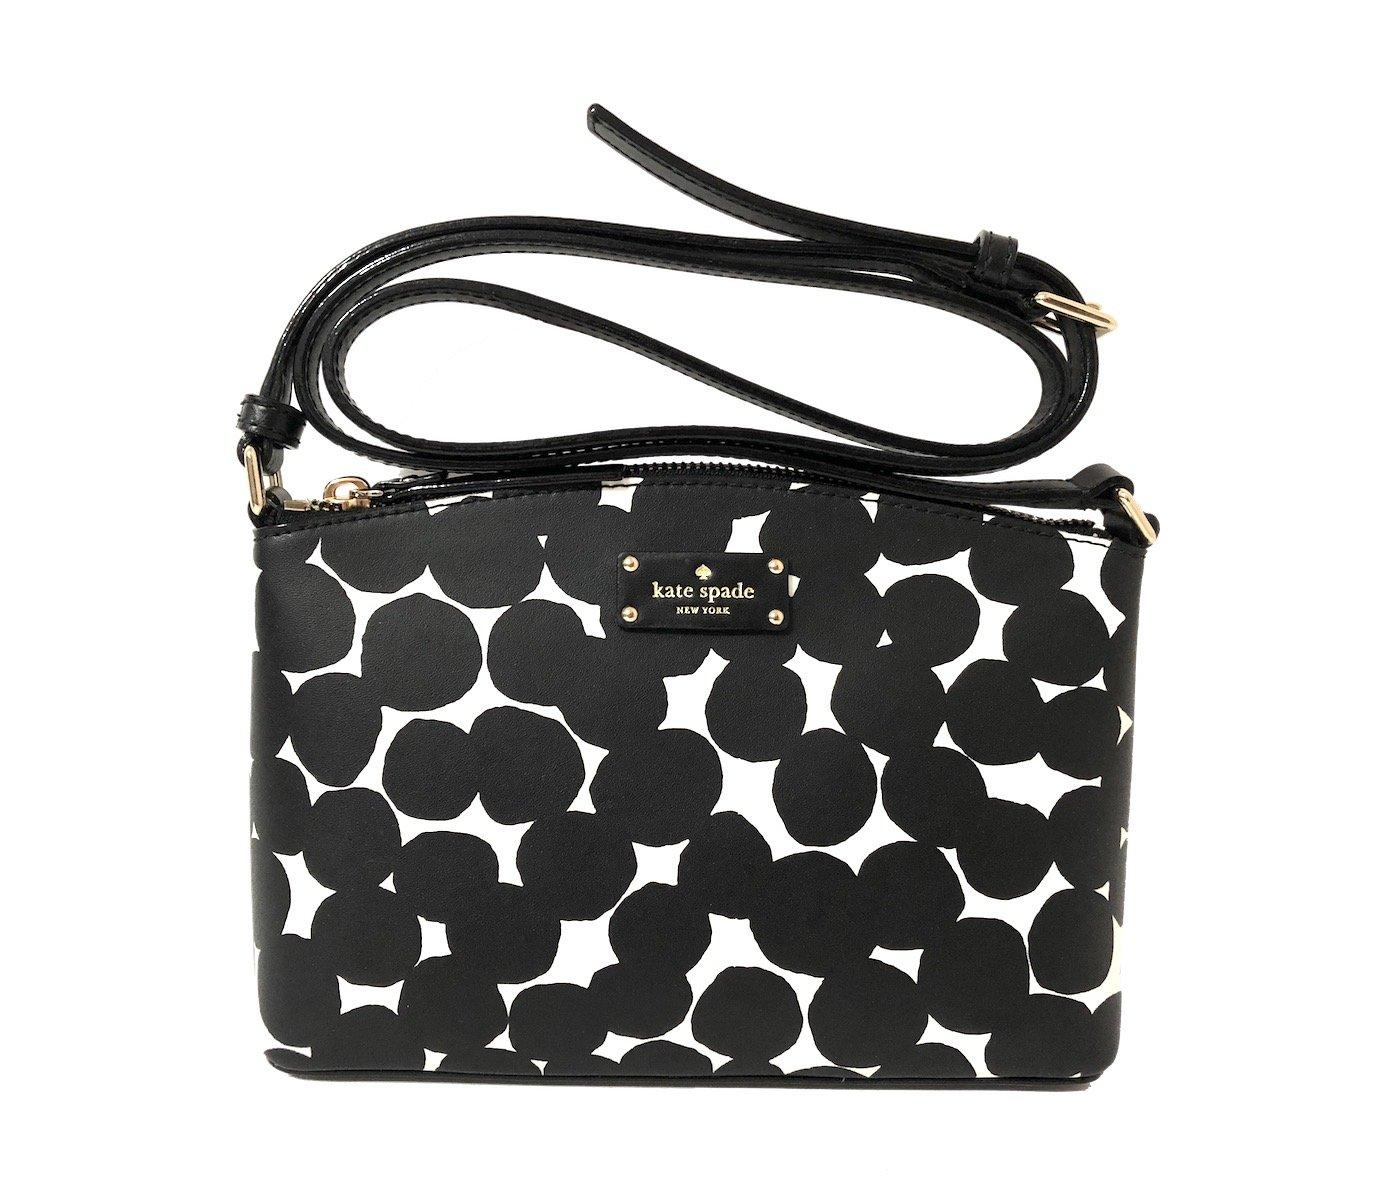 Kate Spade New York Grove Street Millie Leather Shoulder Handbag Purse (Black/Cream)